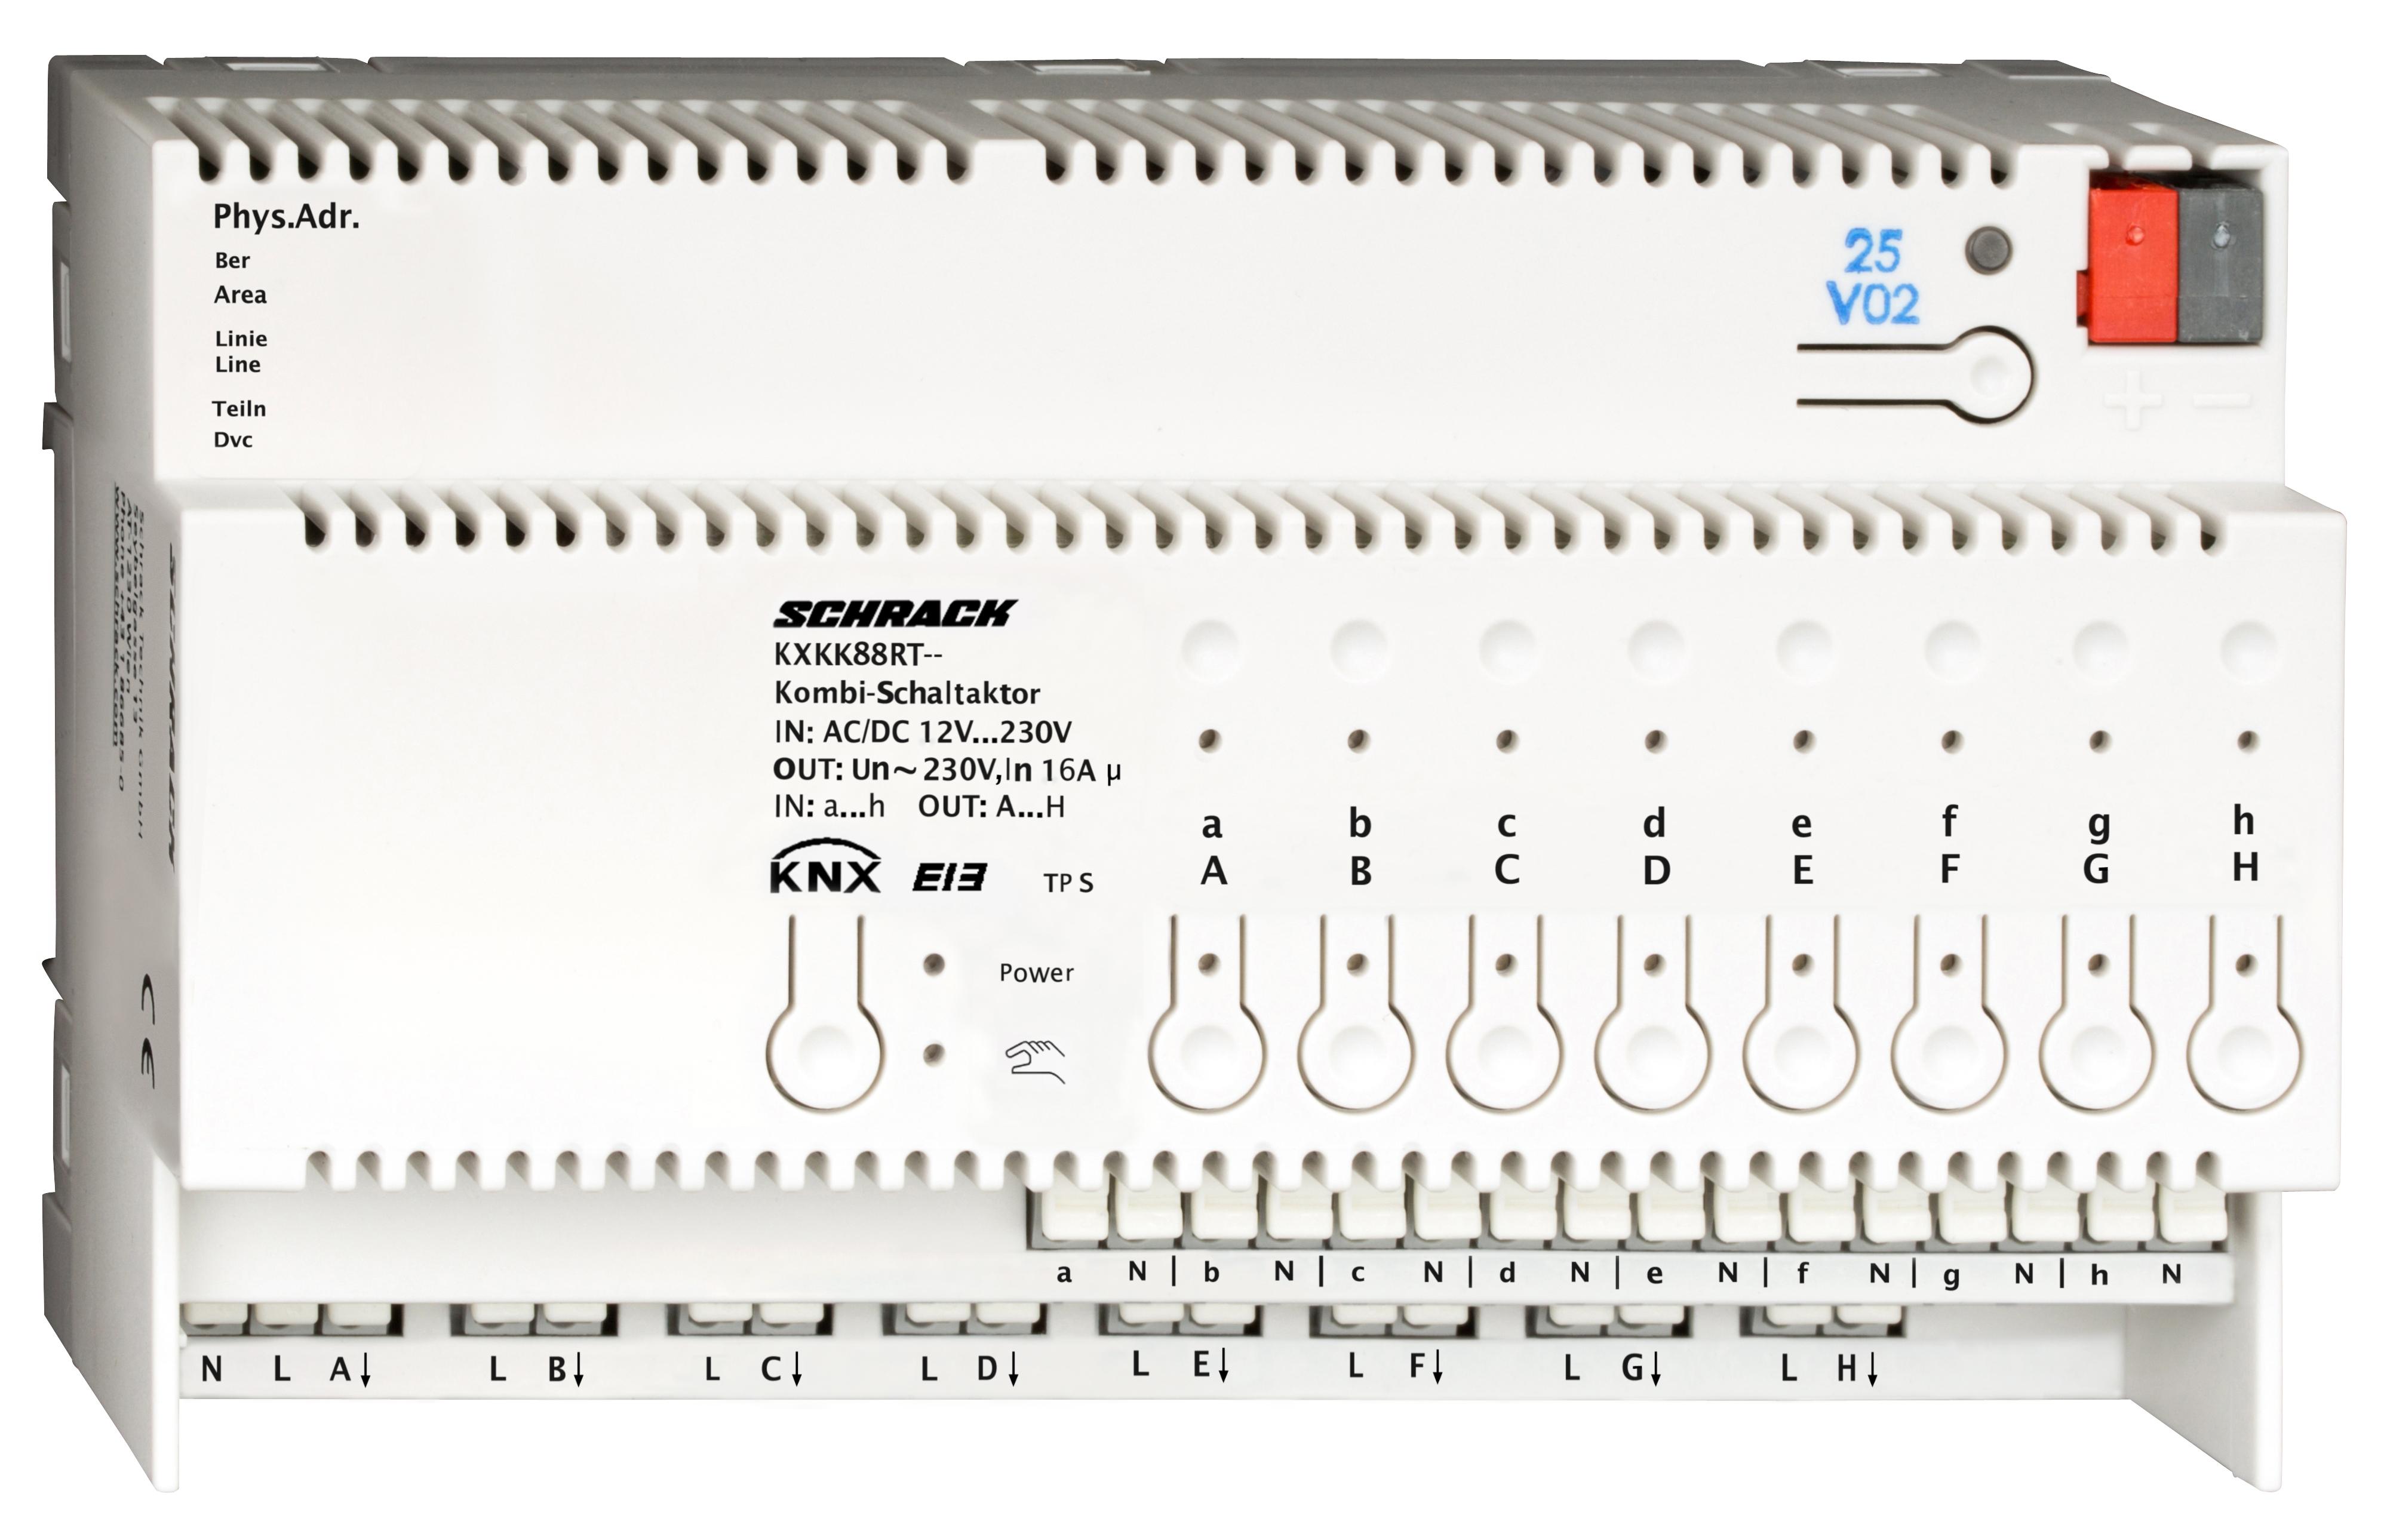 1 Stk KNX Kombi-Schaltaktor, 8 x AC 230V, 16 A, 8 x Binäreingang KXKK88RT--